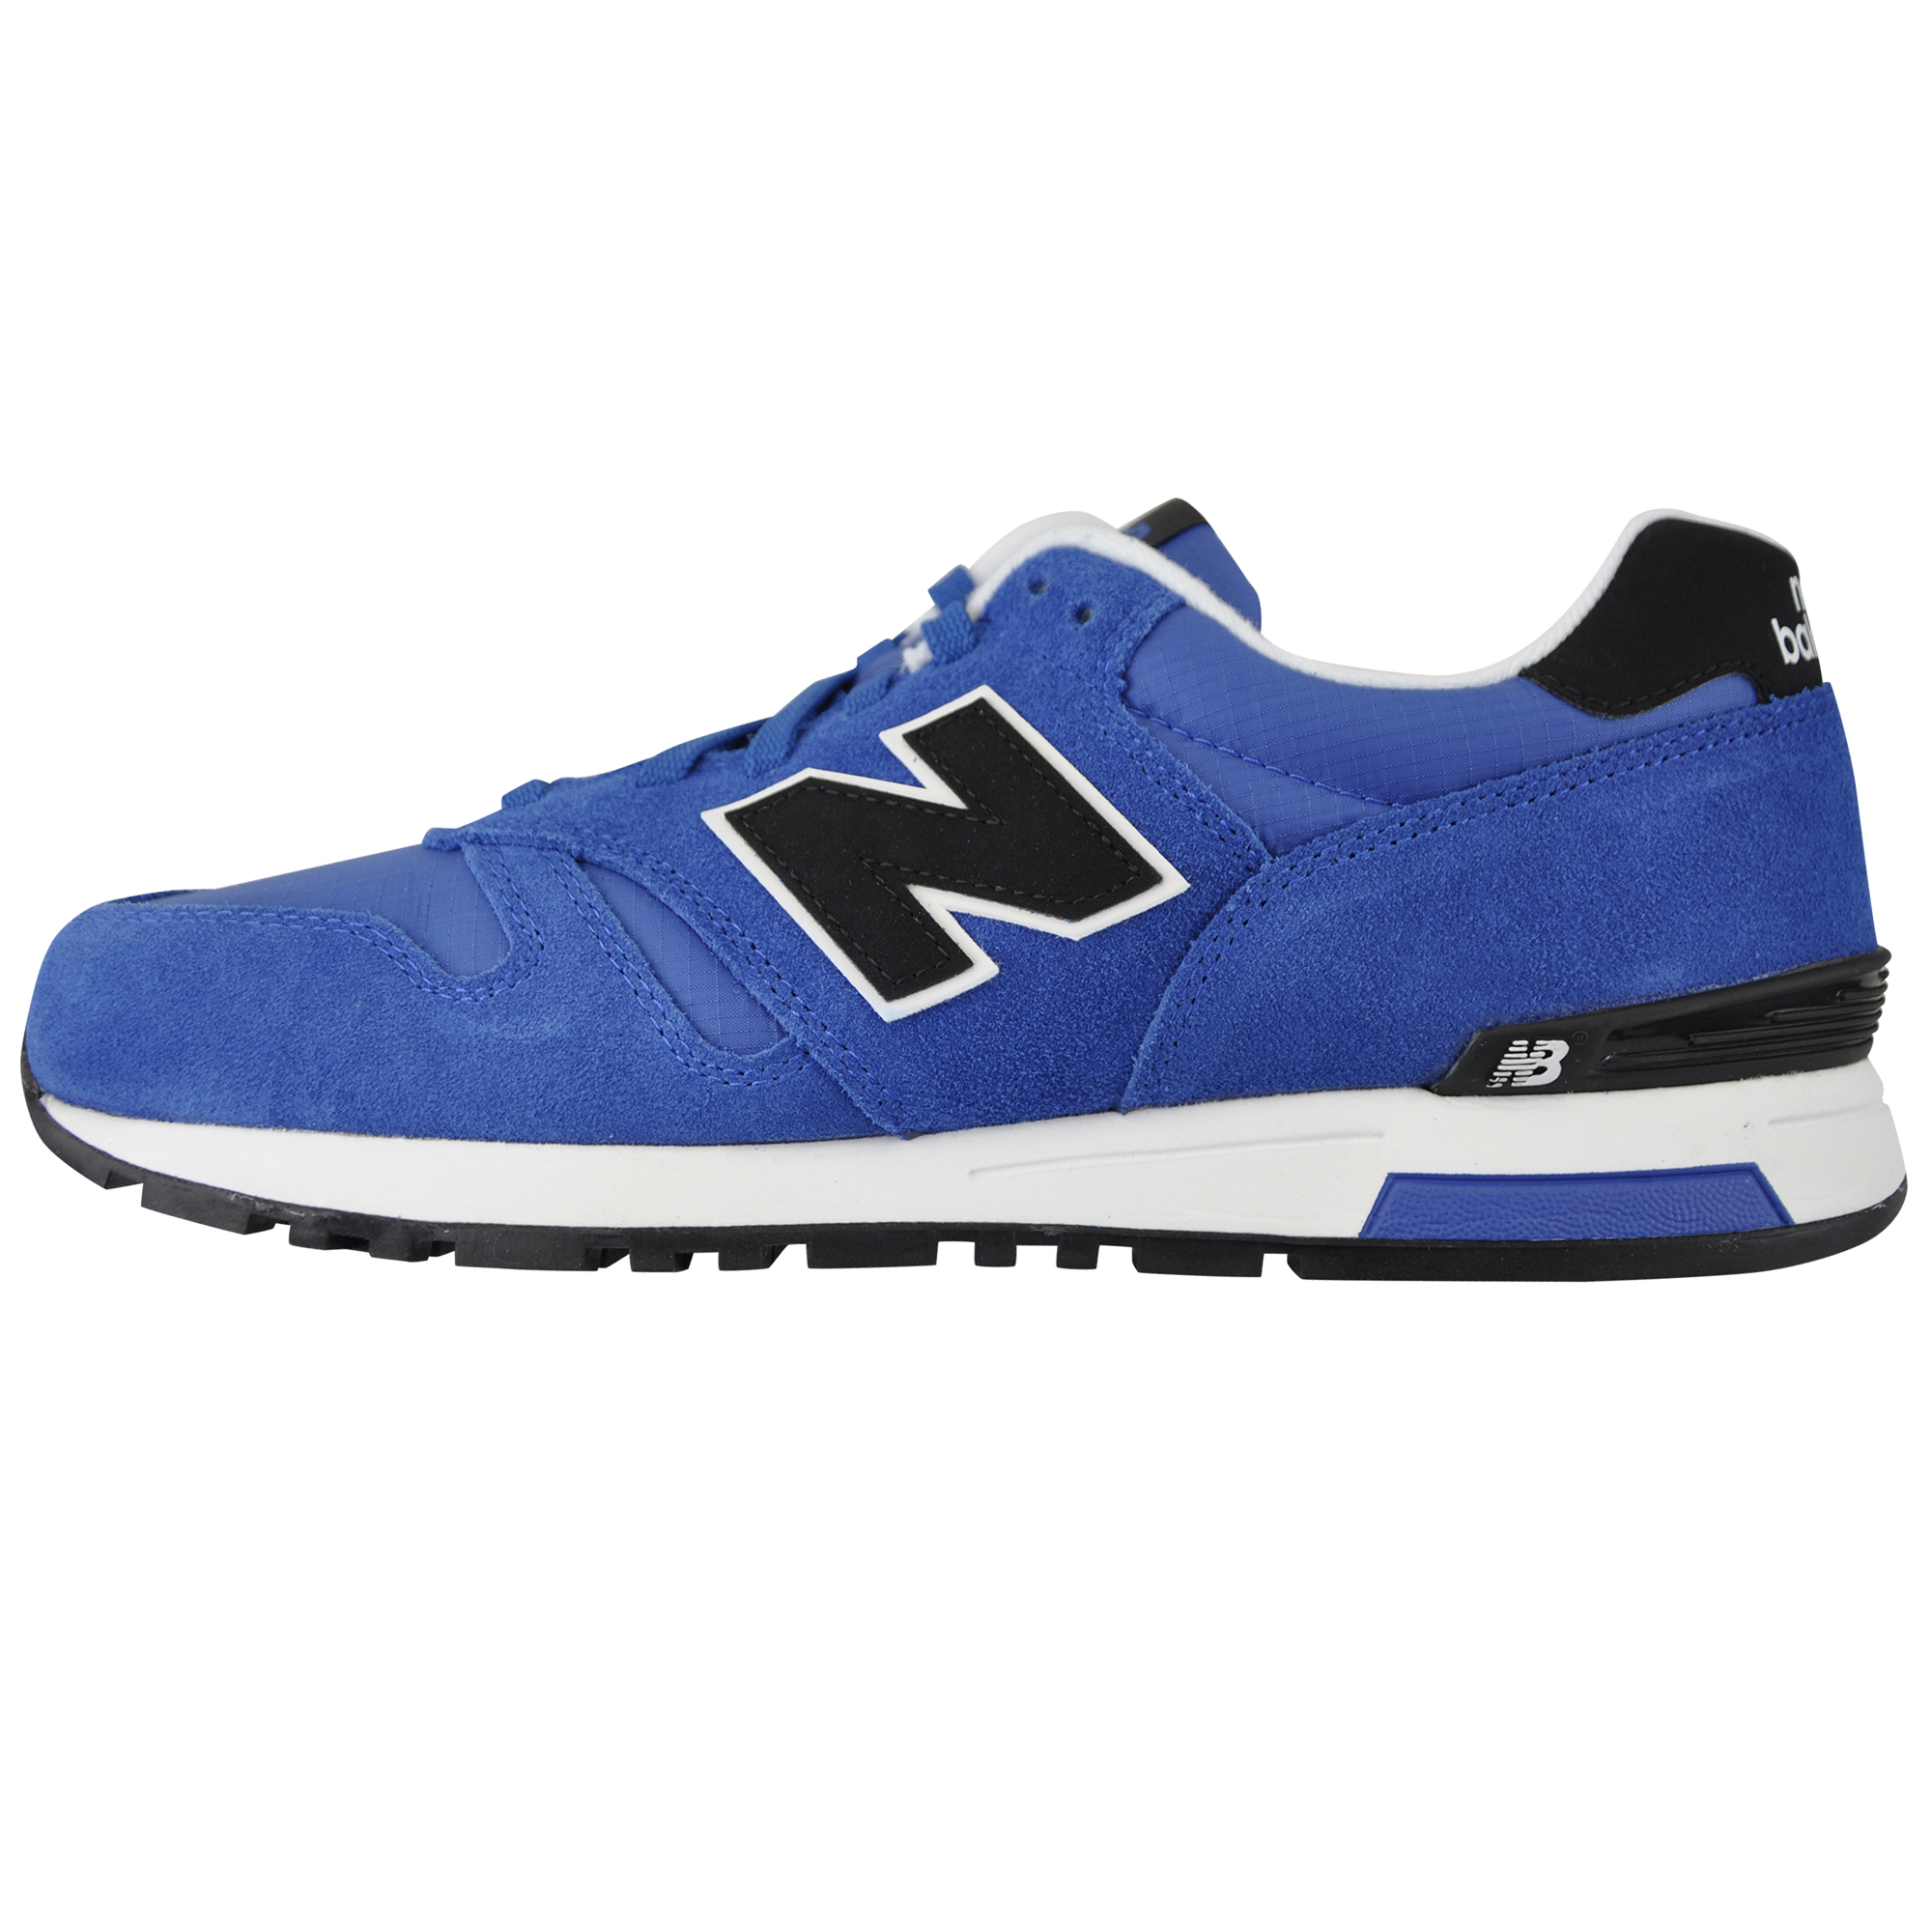 New Balance ML565 ML373 M530 Freizeitschuhe Herrenschuhe Sportschuhe Sneaker